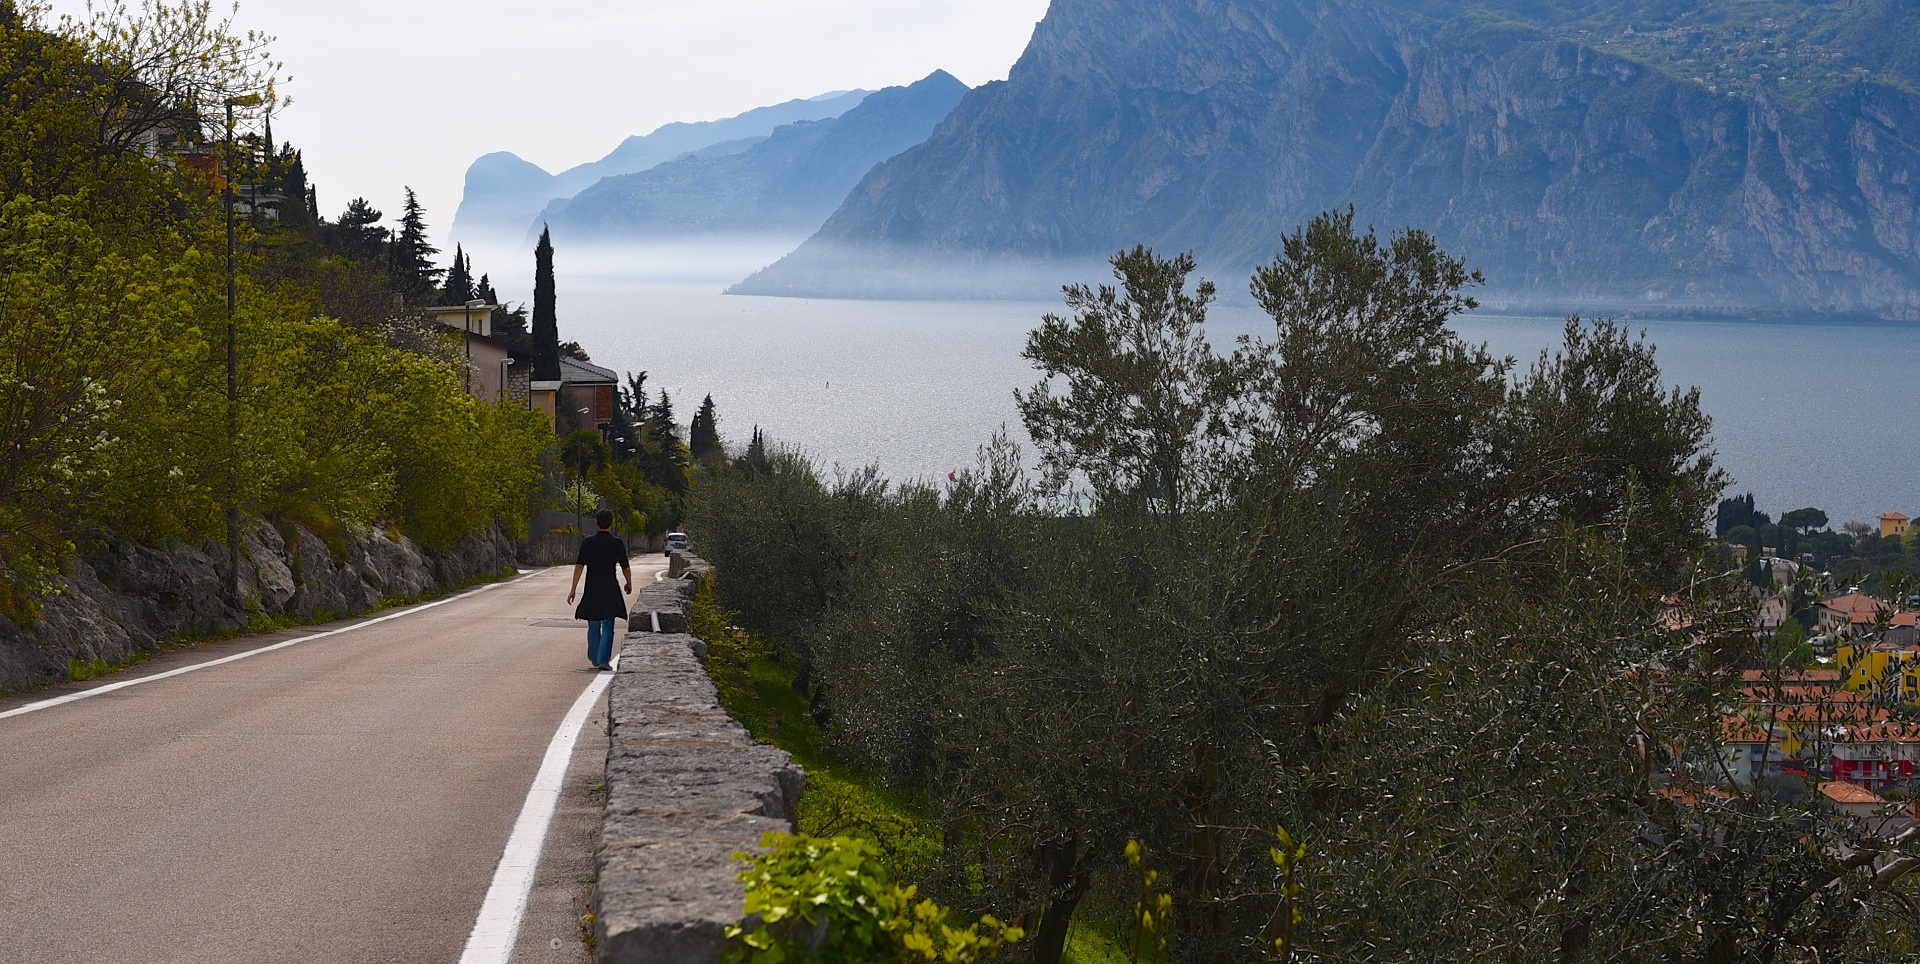 Скачать маршрутную карту - озеро Гарда маршруты